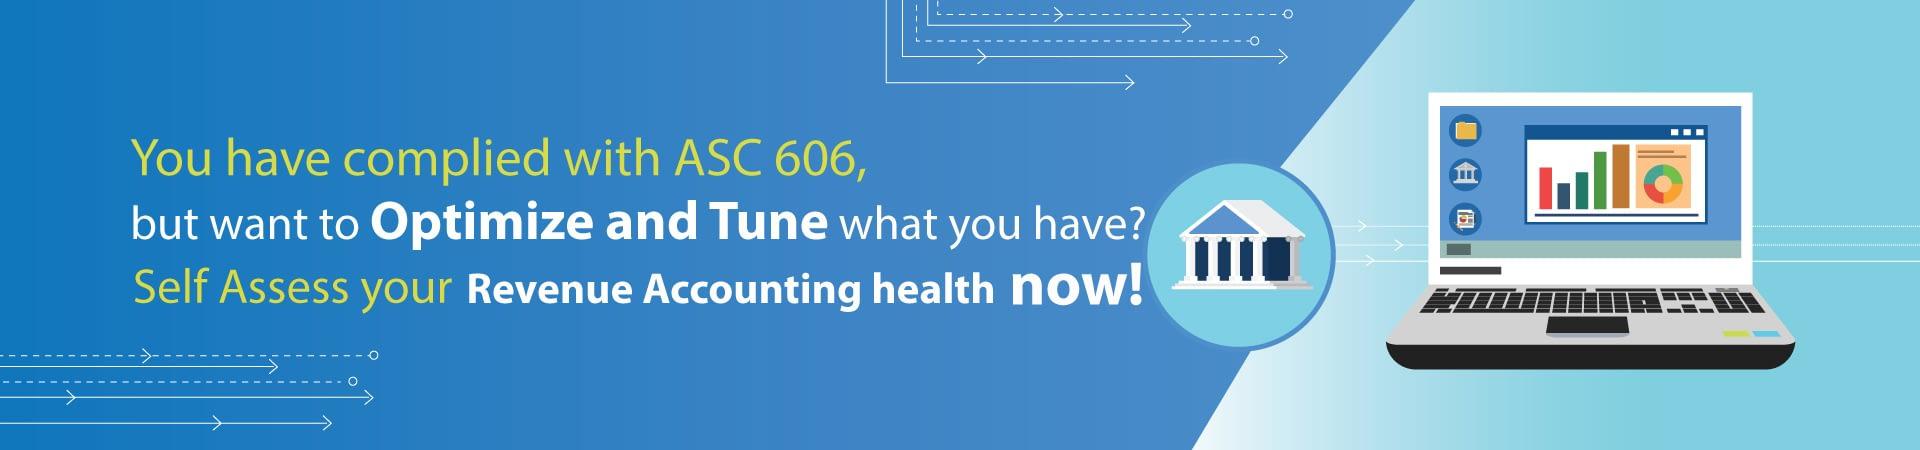 Revenue Recognition Health Check Assessment Slider Banner